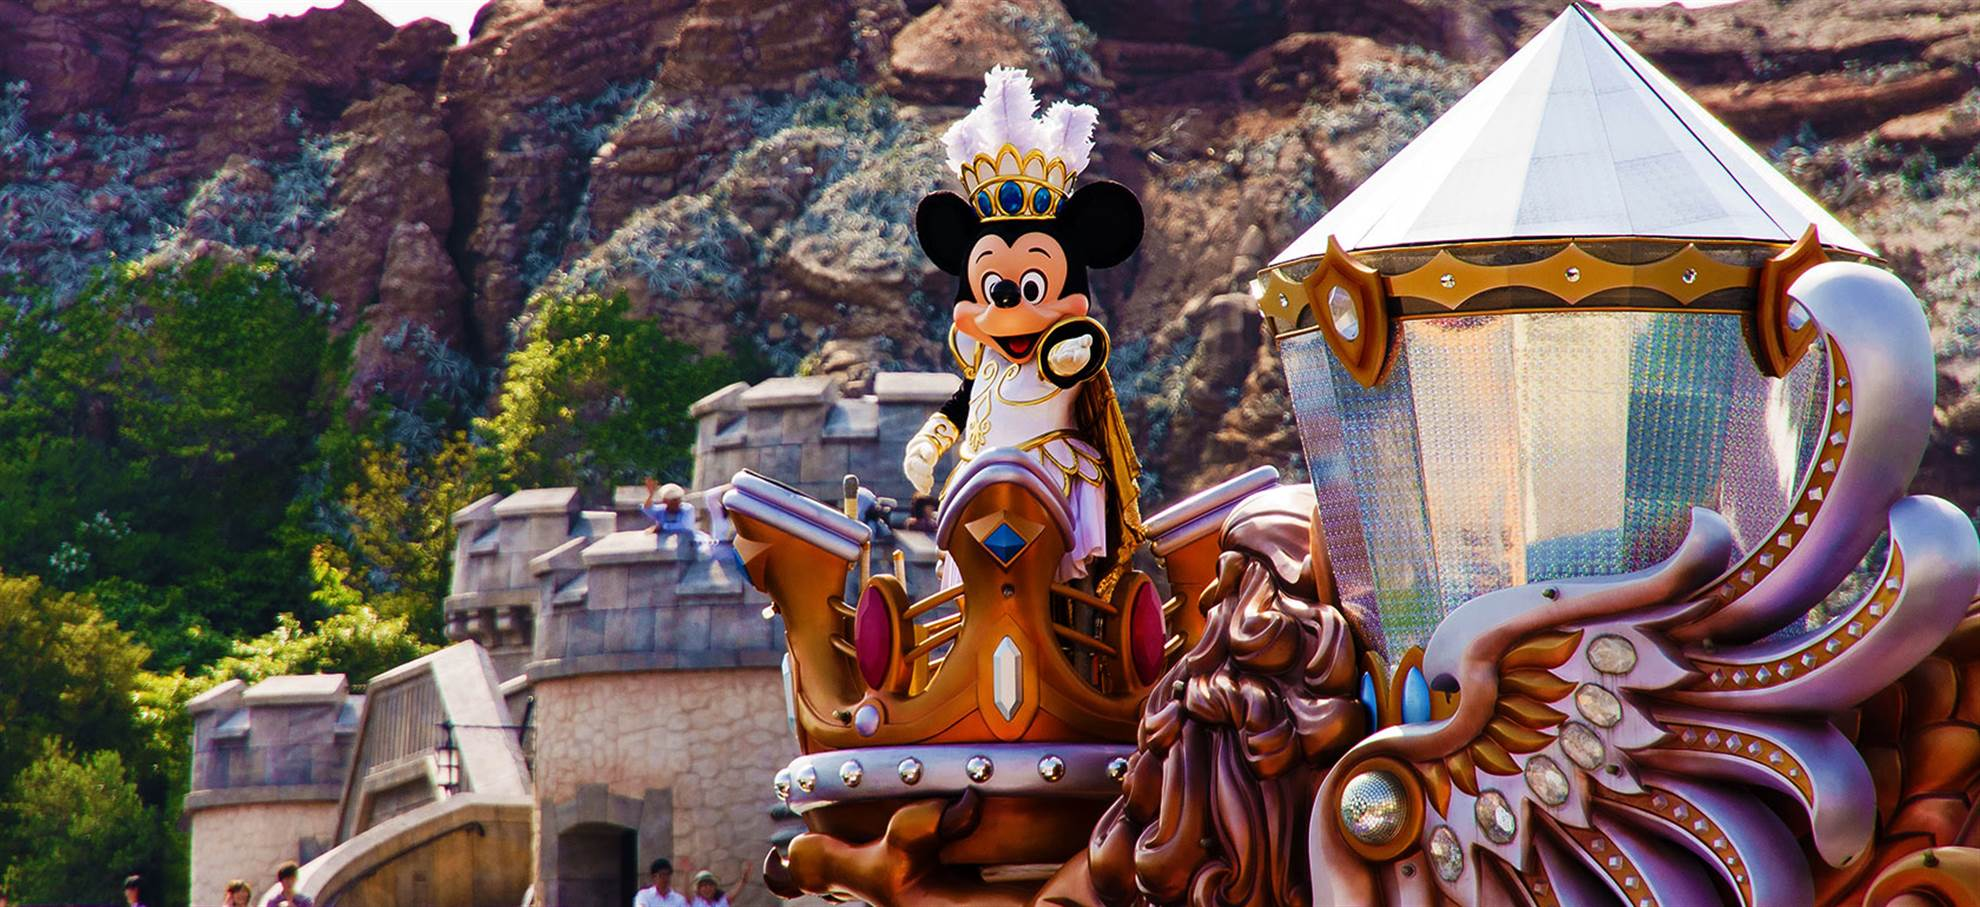 Disneyland Paris - 1 endagsbiljett = 2 parker